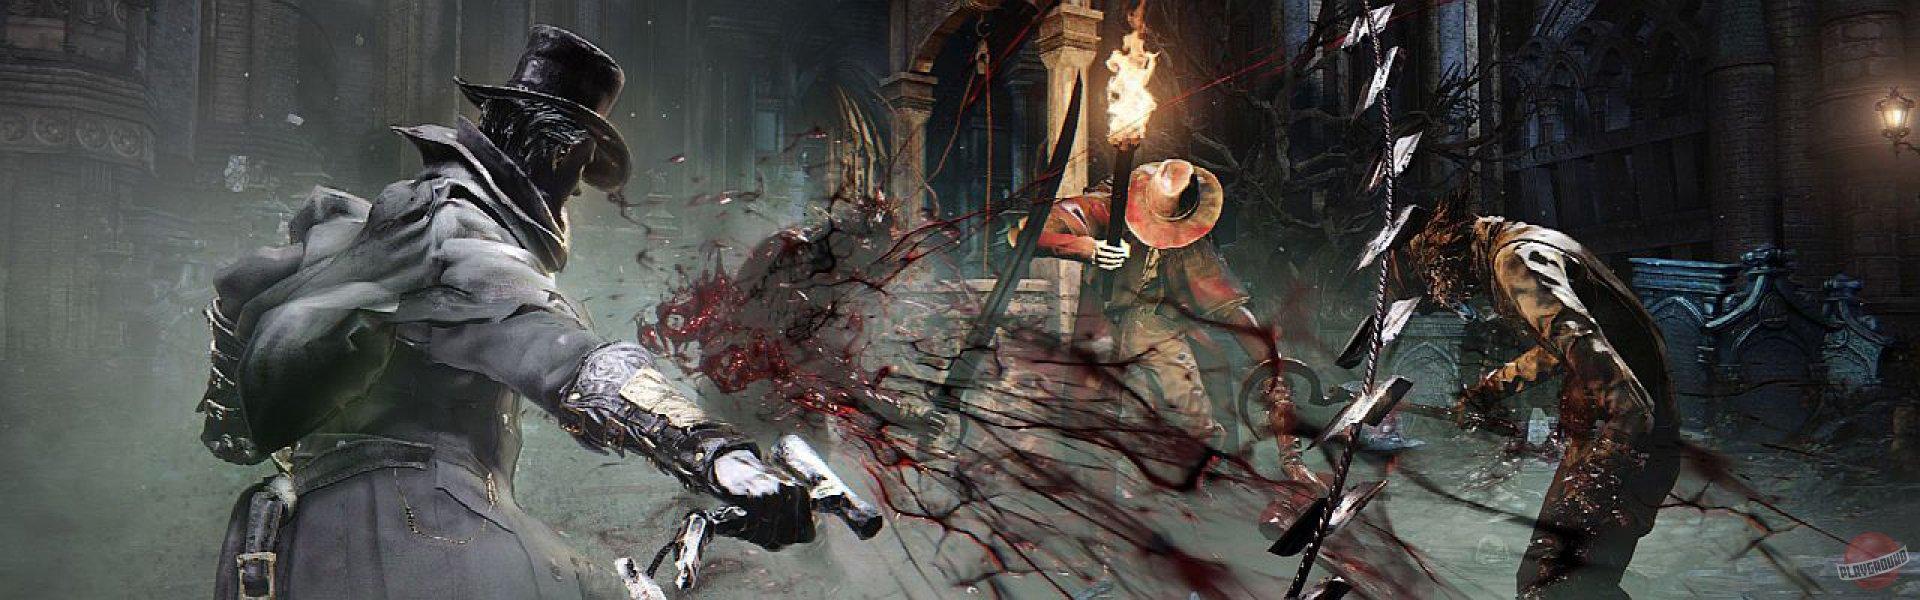 Bloodborne: Порождение Крови (Bloodborne: The Card Game)